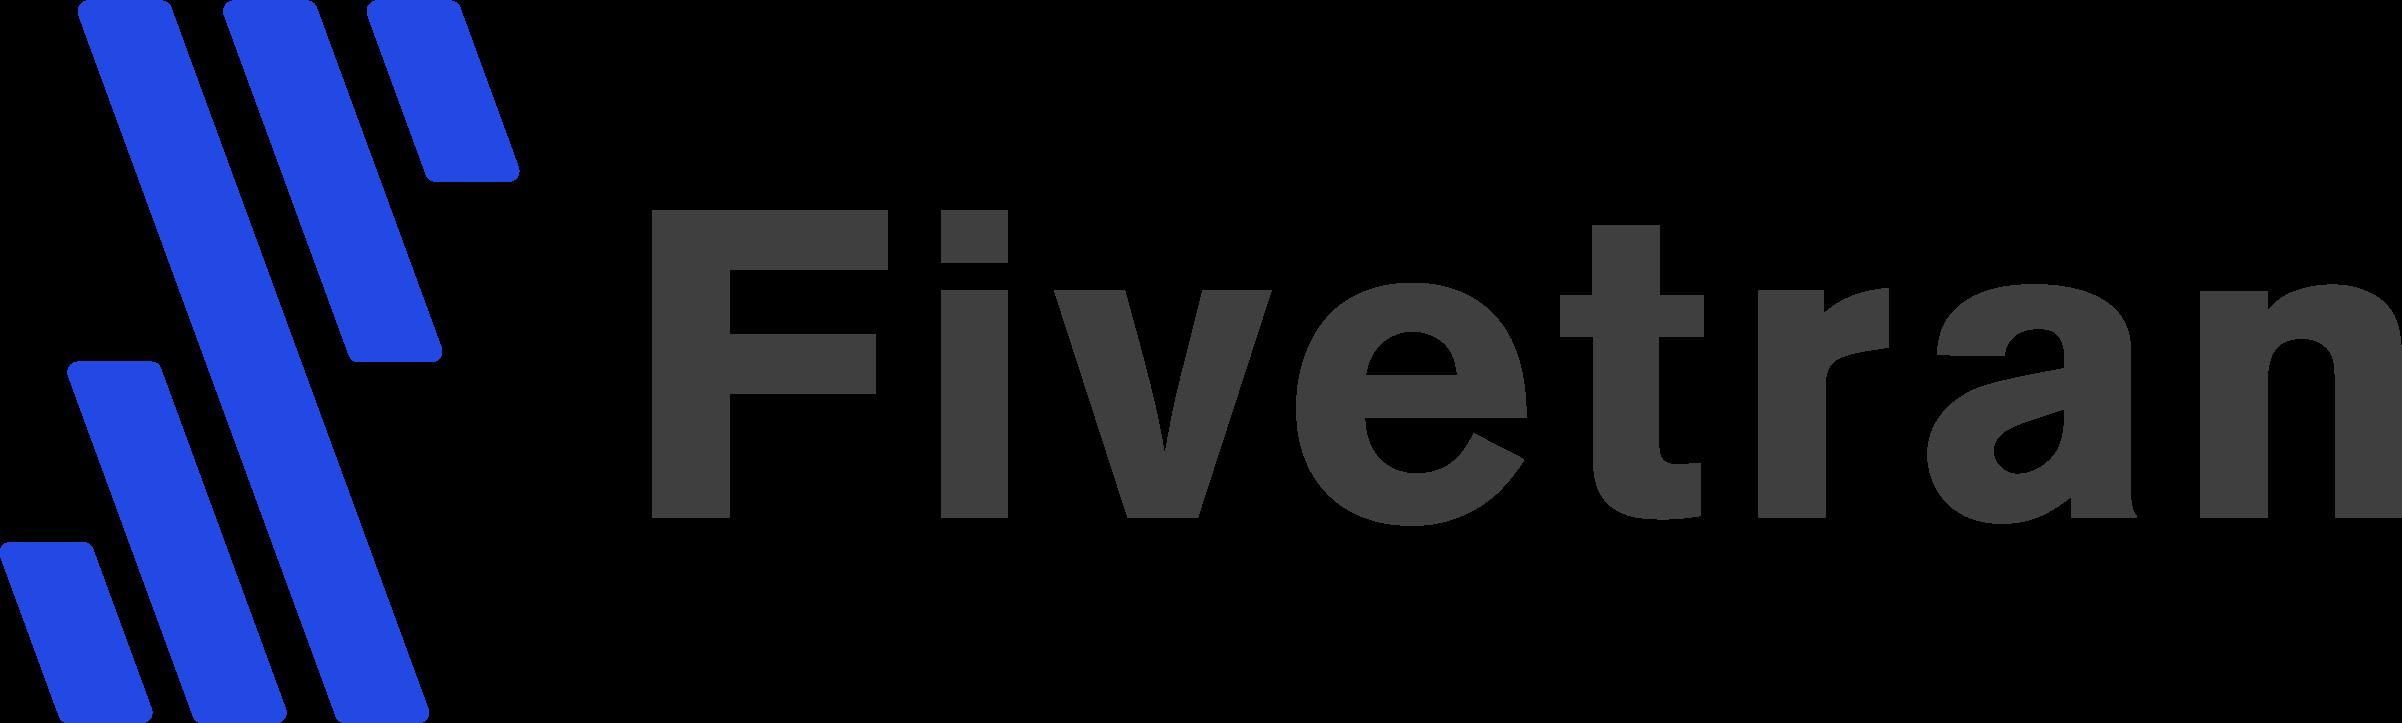 marketing analytics platform - fivetran